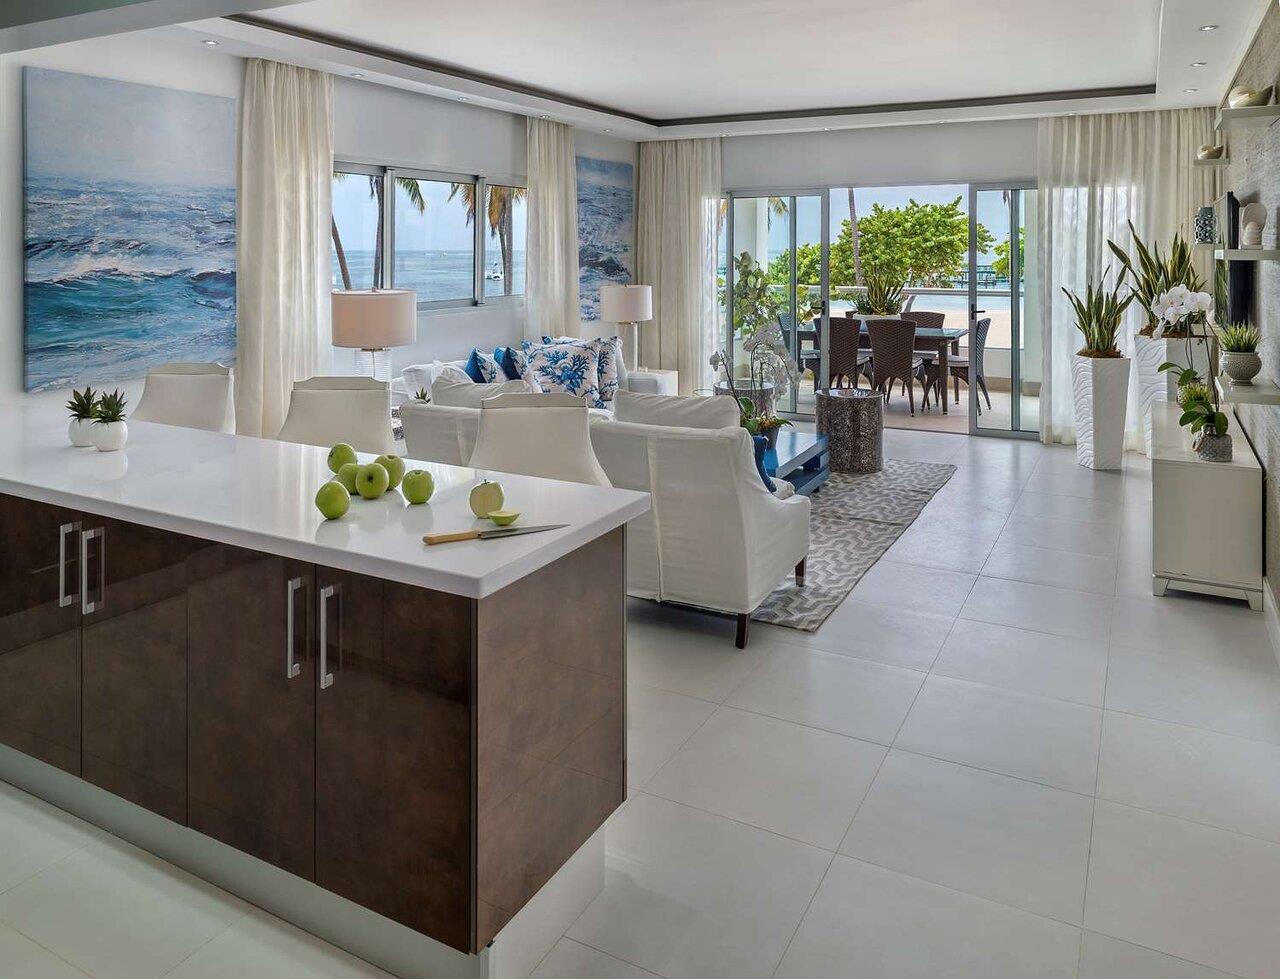 radisson-blu-resort-residence-genel-0020